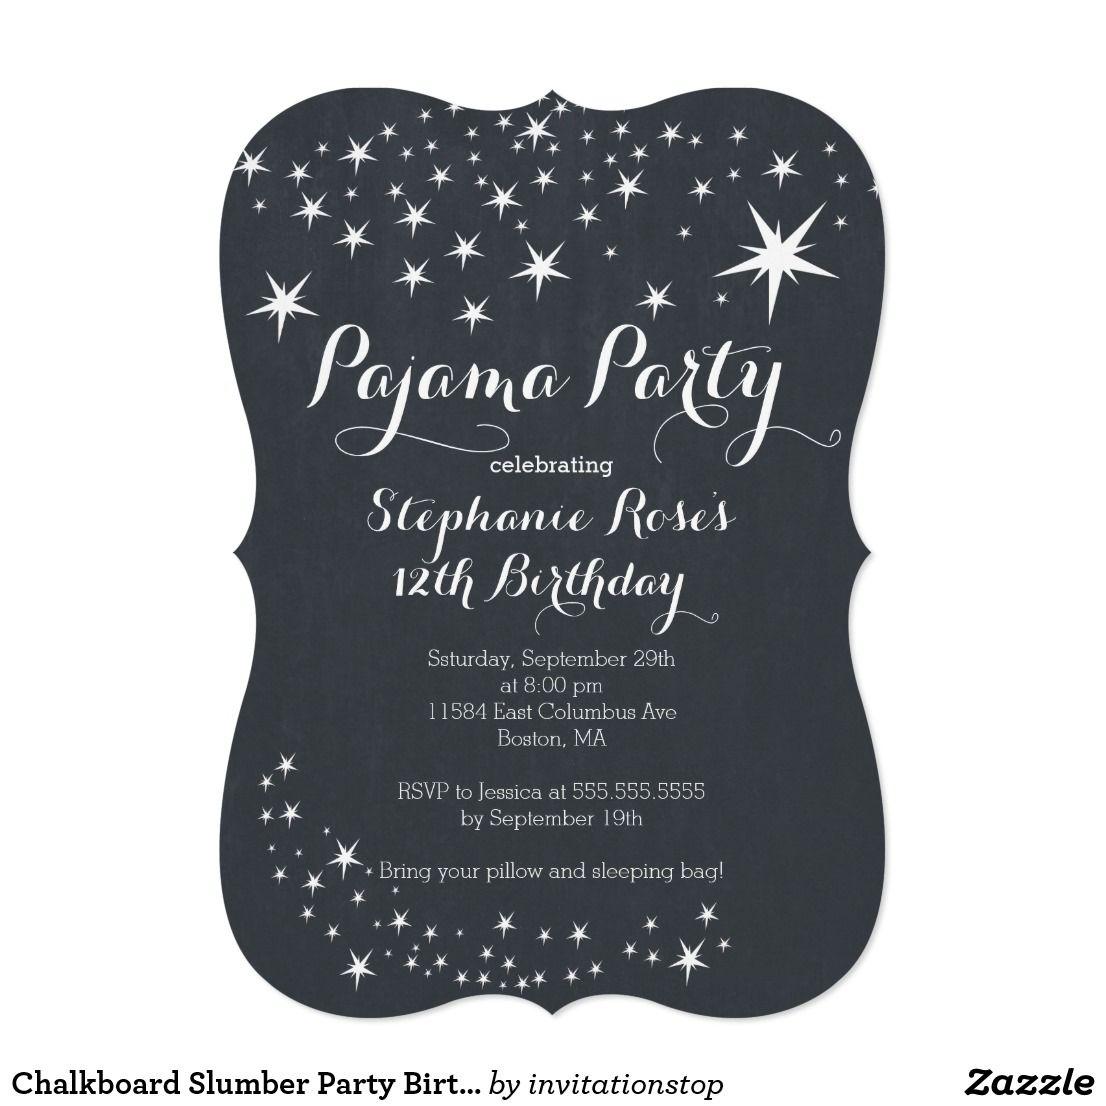 Chalkboard Slumber Party Birthday Party Invitation | Slumber party ...